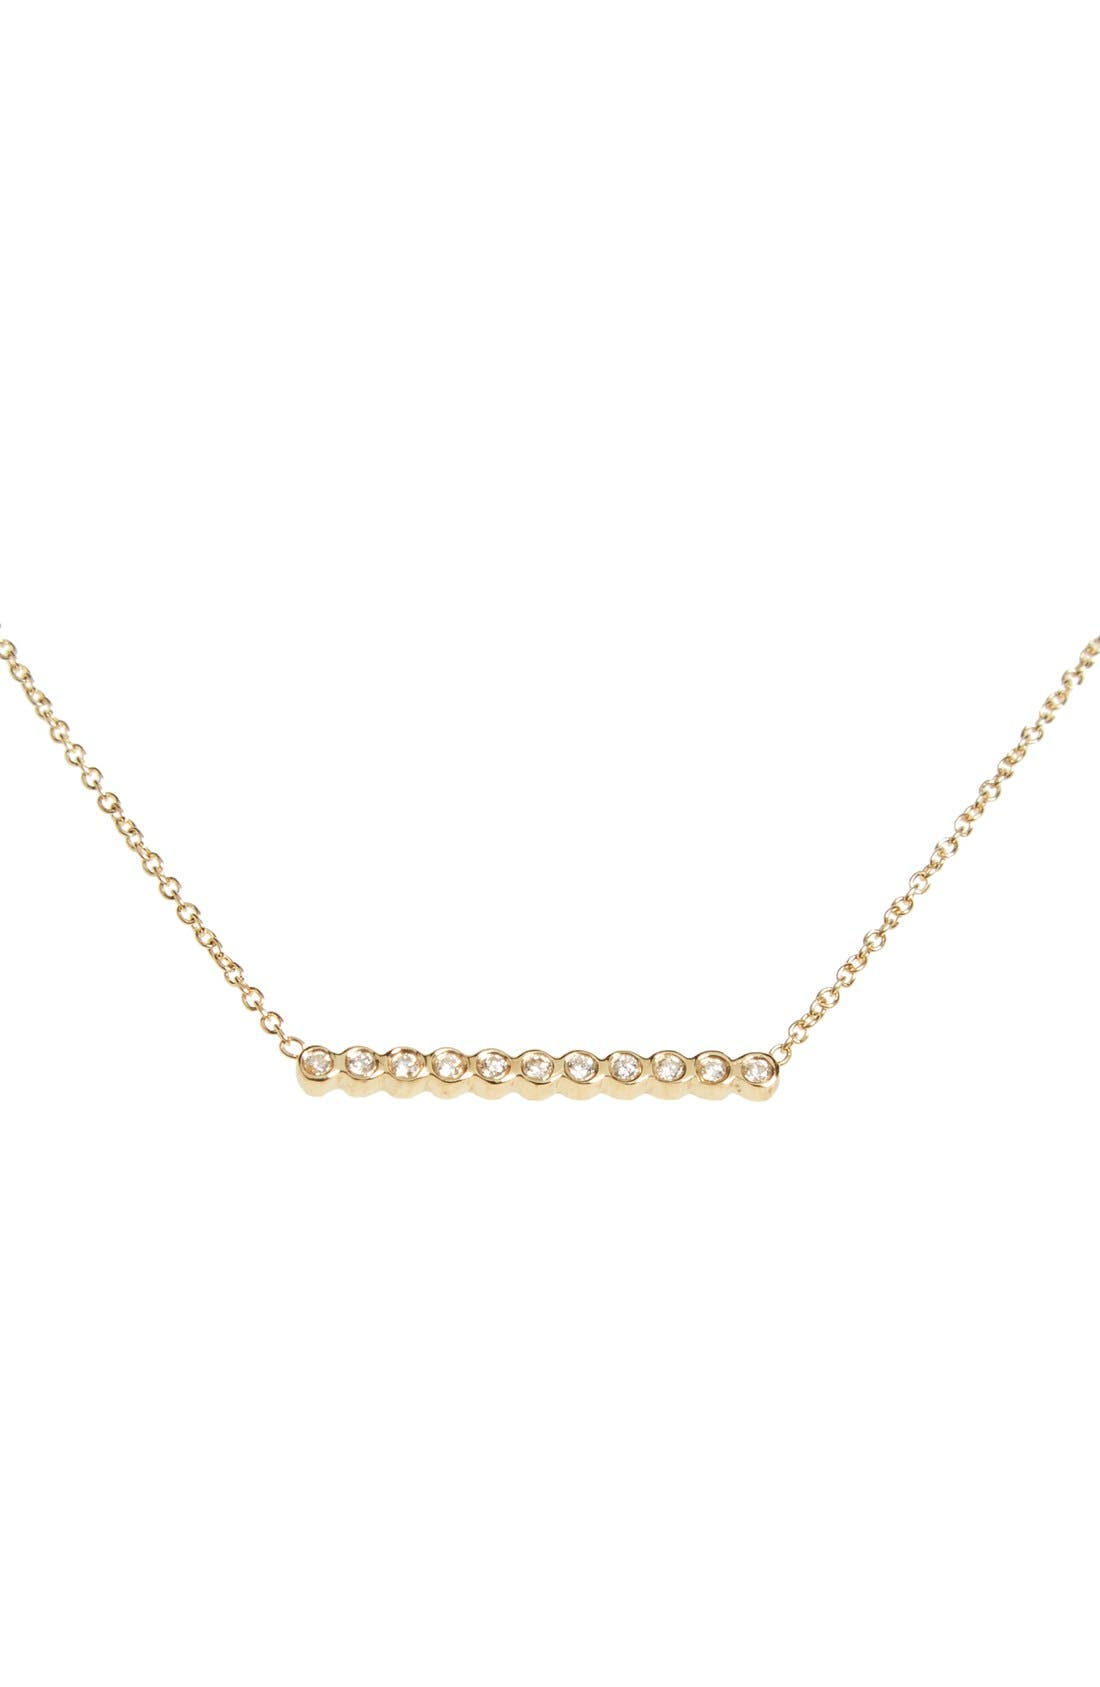 Diamond Bar Pendant Necklace,                             Main thumbnail 1, color,                             YELLOW GOLD